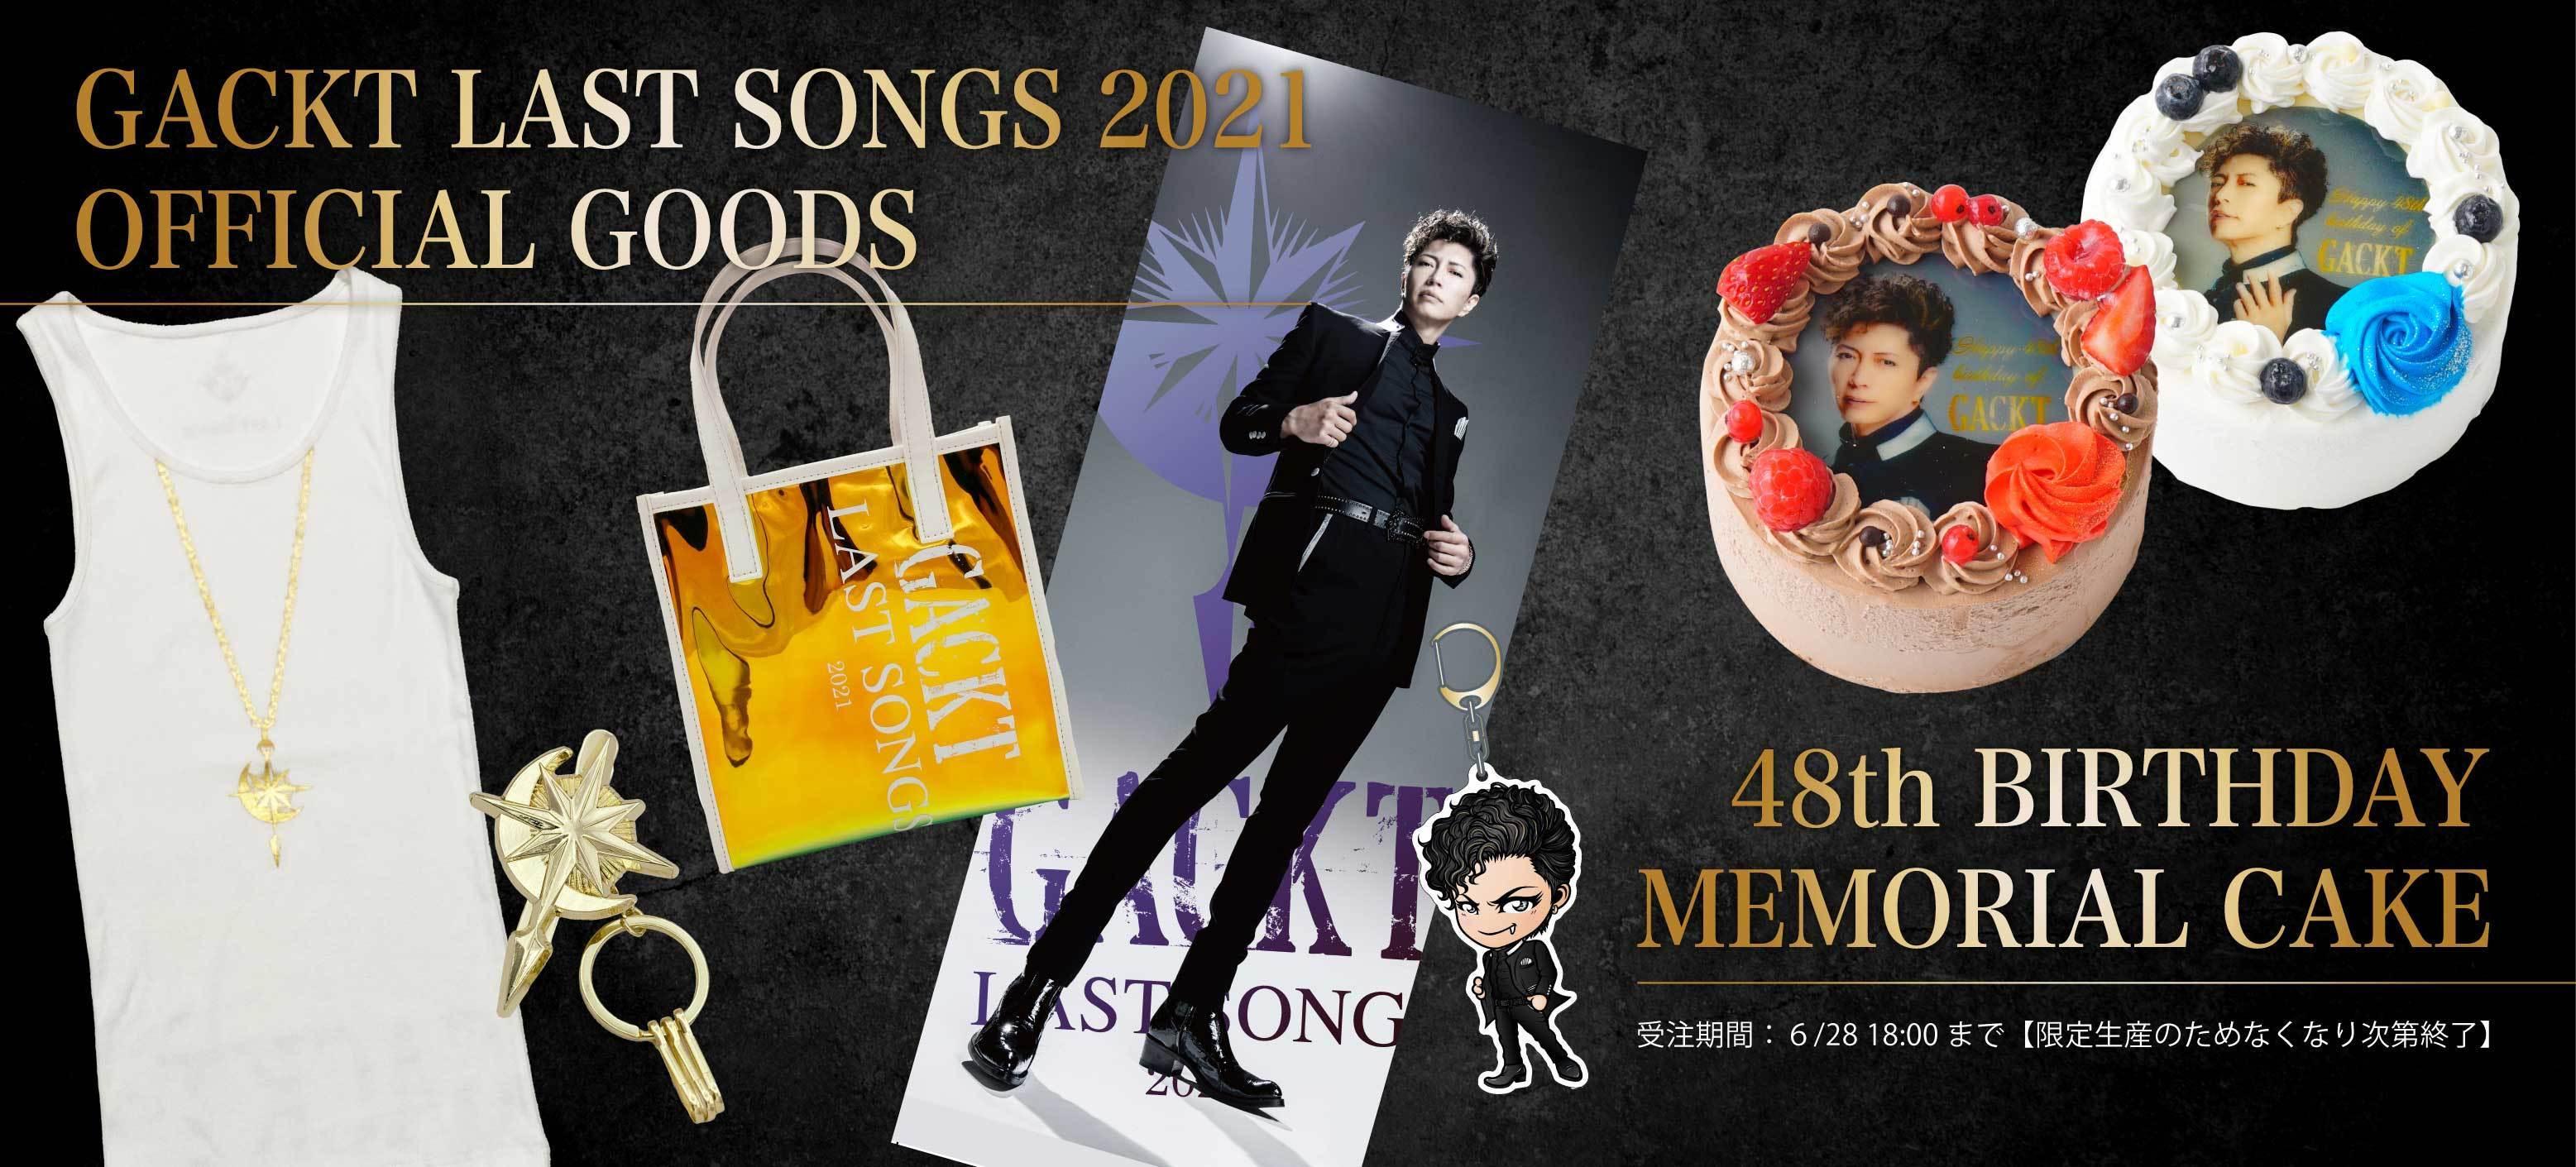 「GACKT LAST SONGS 2021 feat. K」オフィシャルグッズ GACKT 48th Birthday MEMORIAL CAKE  同時発売開始のお知らせ